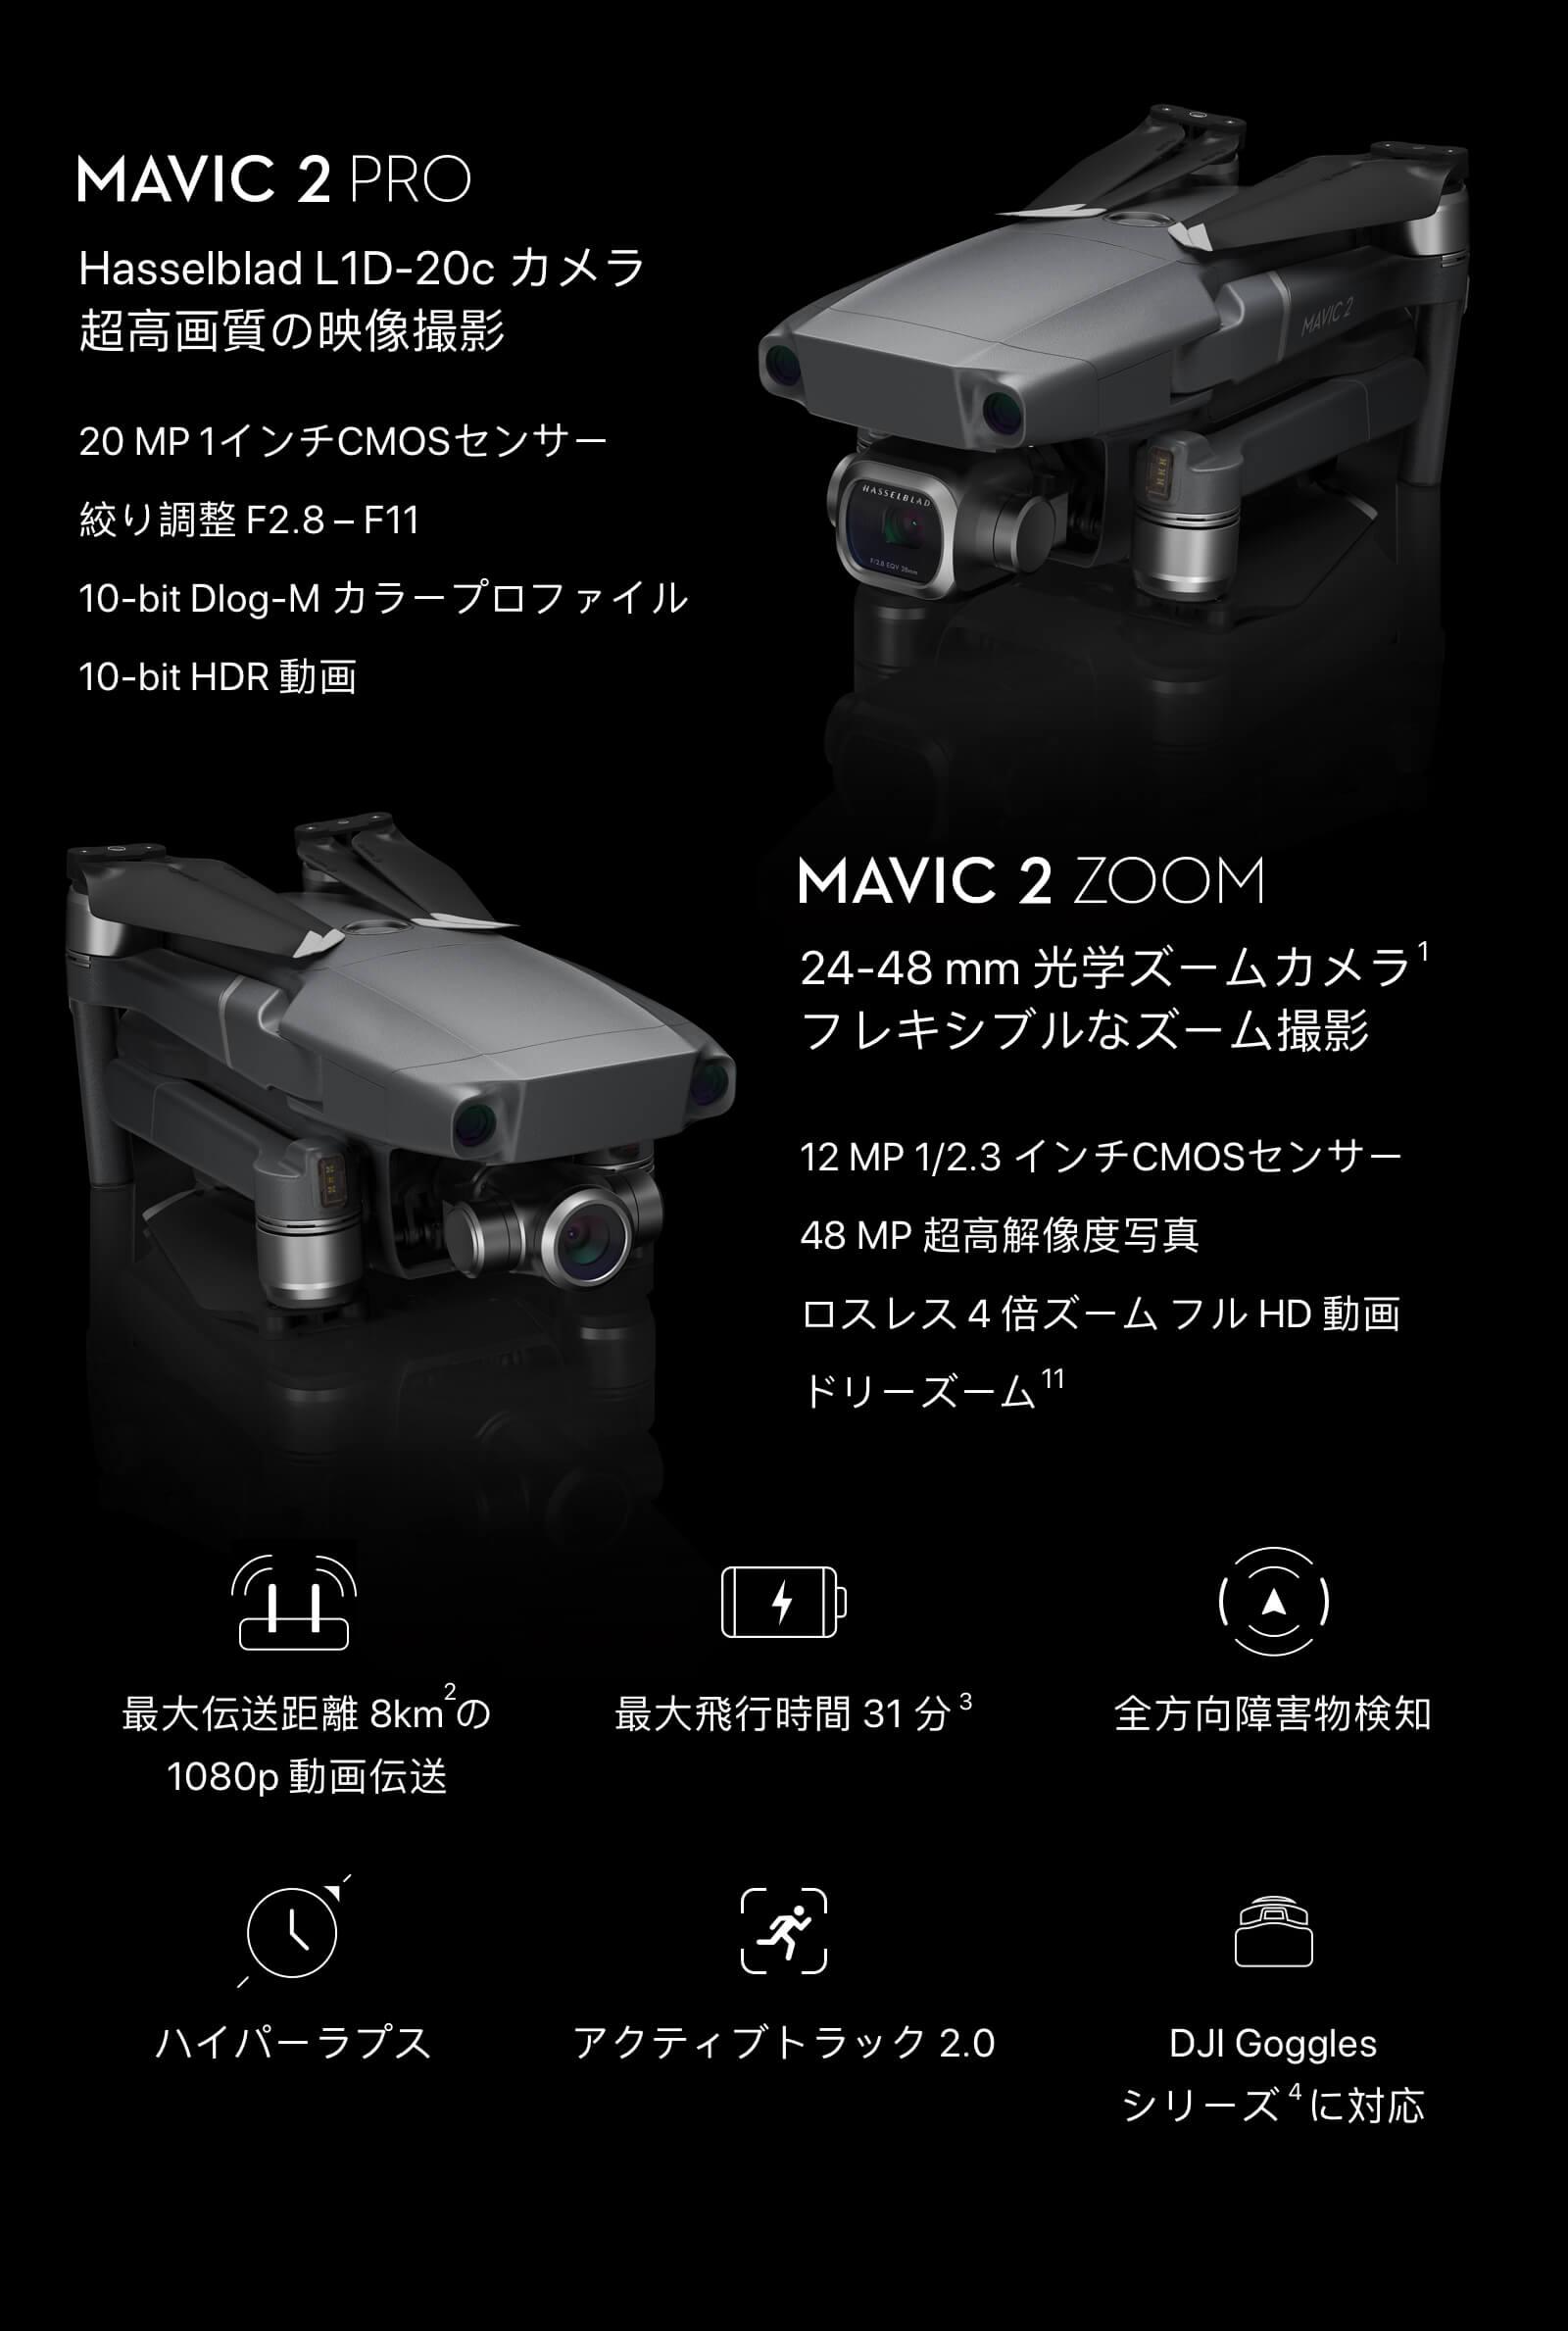 Mavic 2 Pro Hasselblad L1D-20cカメラ搭載、Mavic 2 Zoom 24-48mm光学ズームカメラ搭載